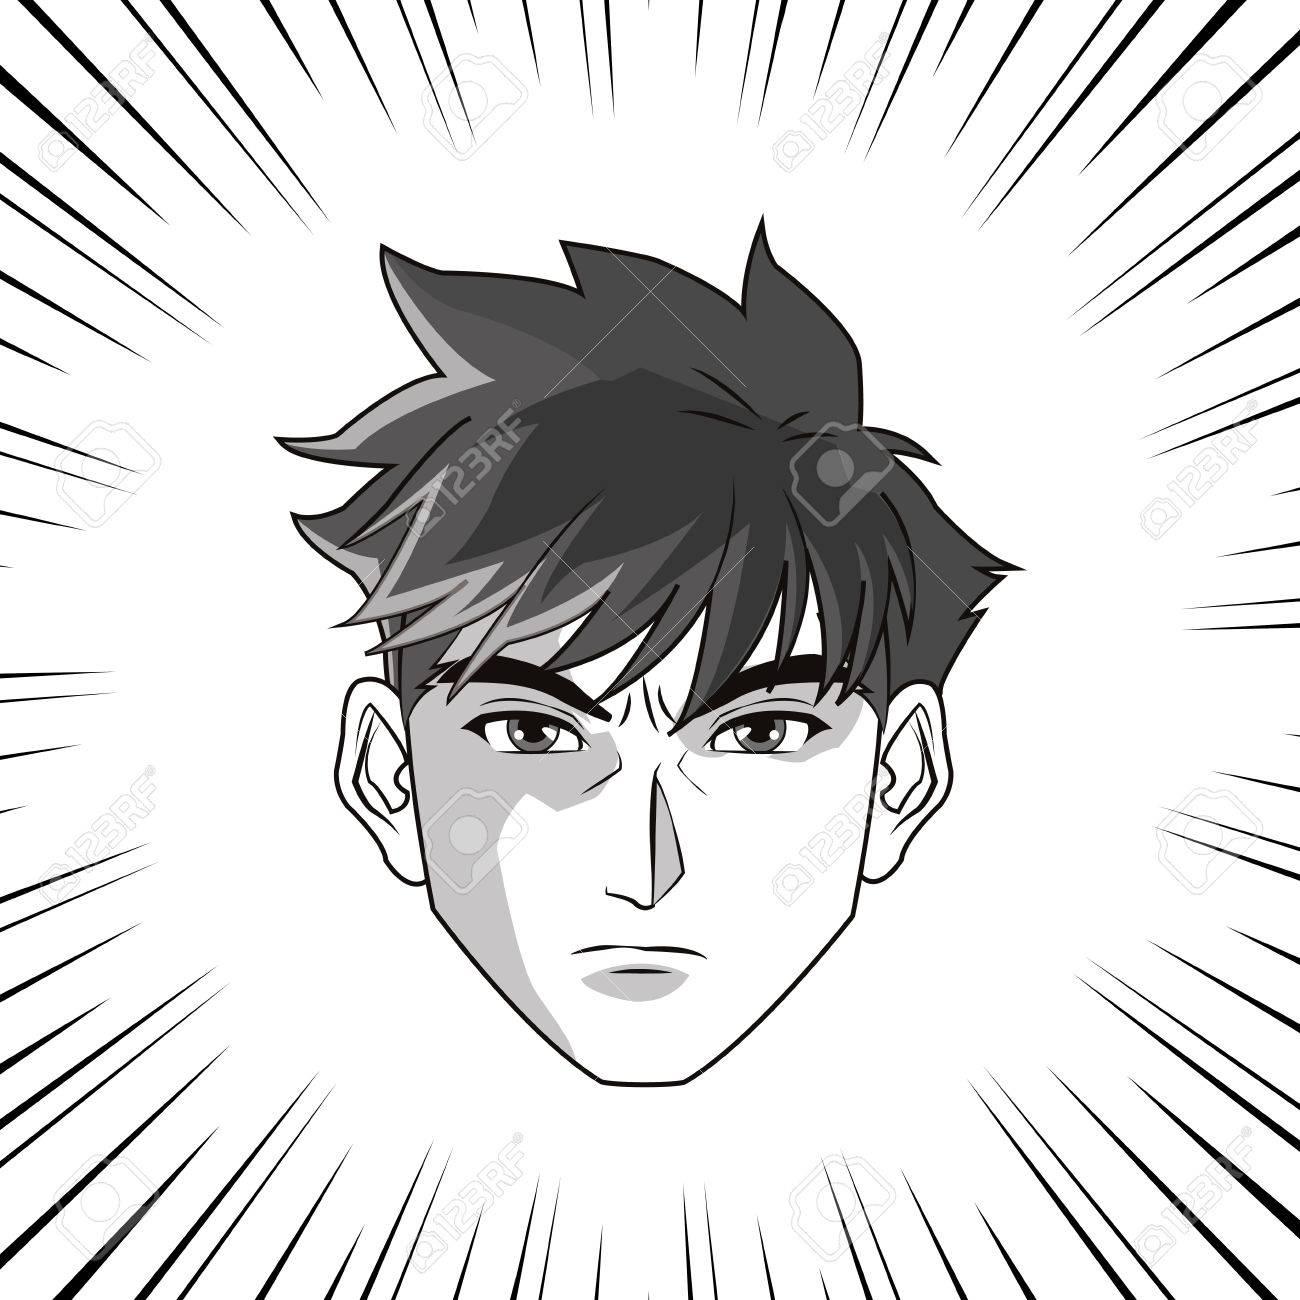 Anime boy or man cartoon icon manga and comic design black